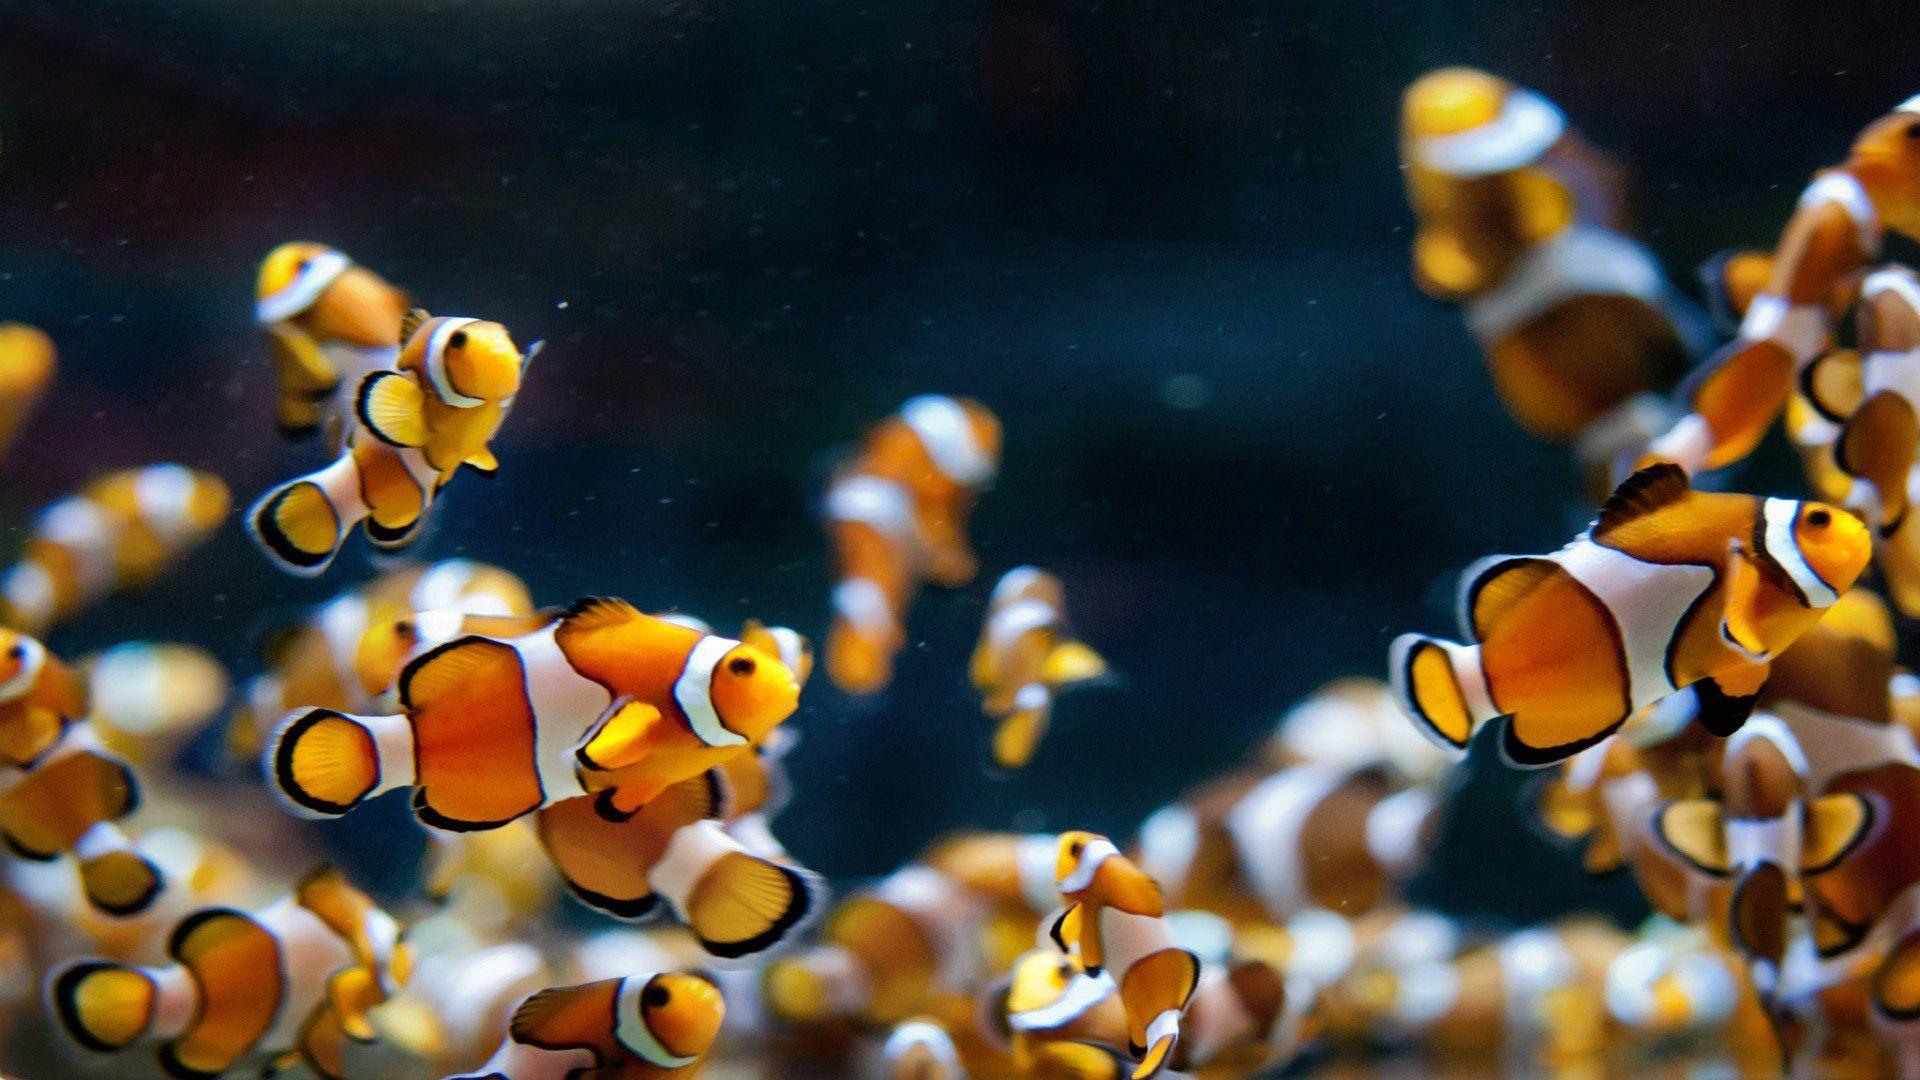 School Of Tropical Fish Hd Desktop Wallpaper High Definition